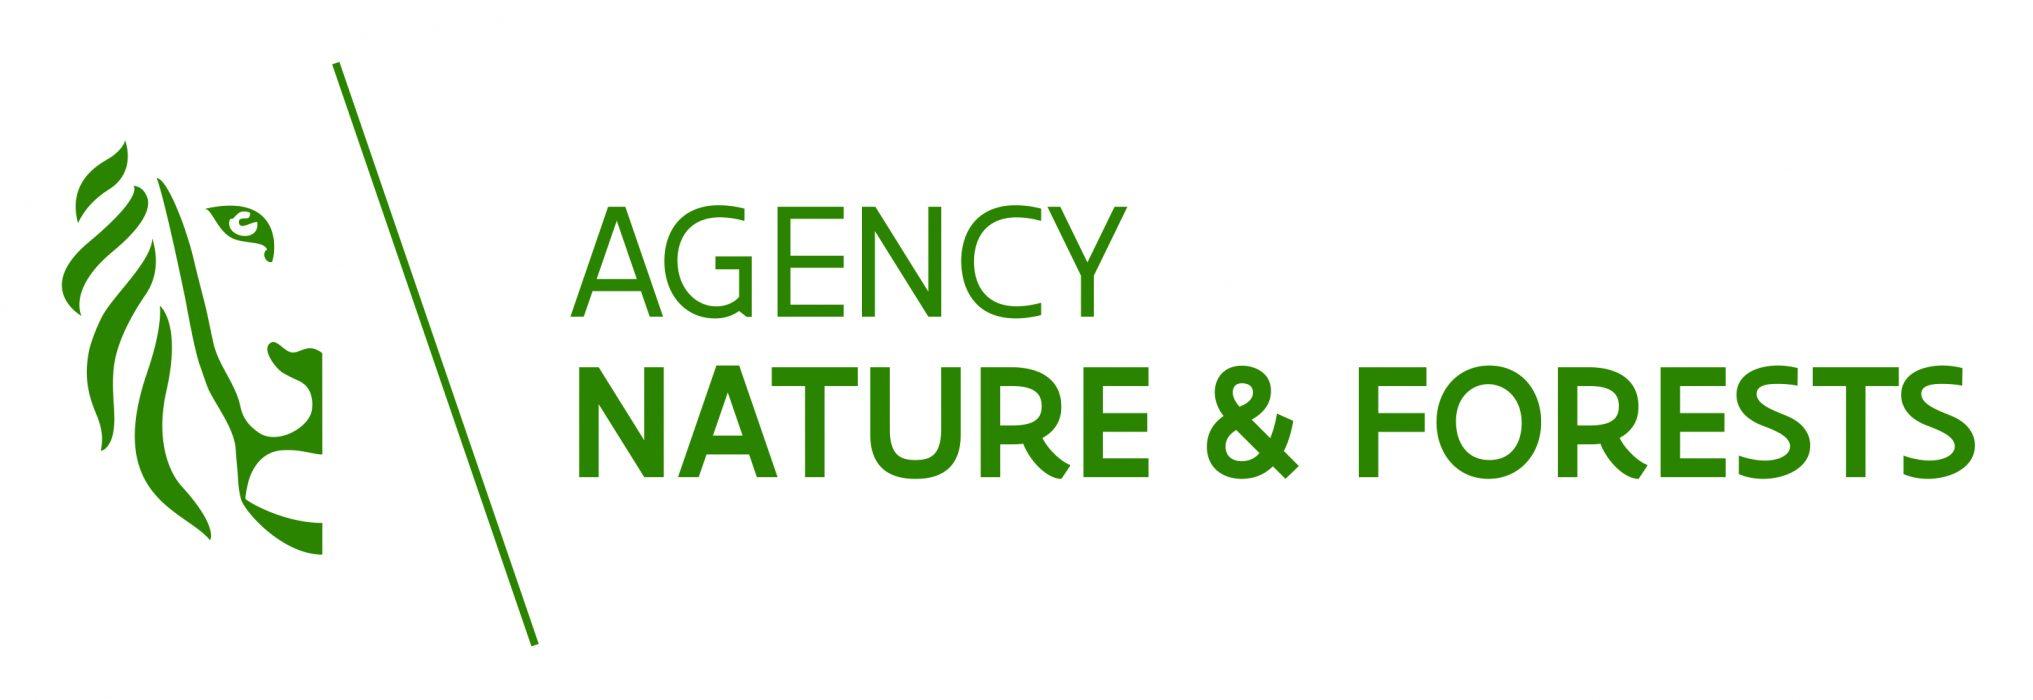 sponsorlogo Agency Nature  Forests pms364